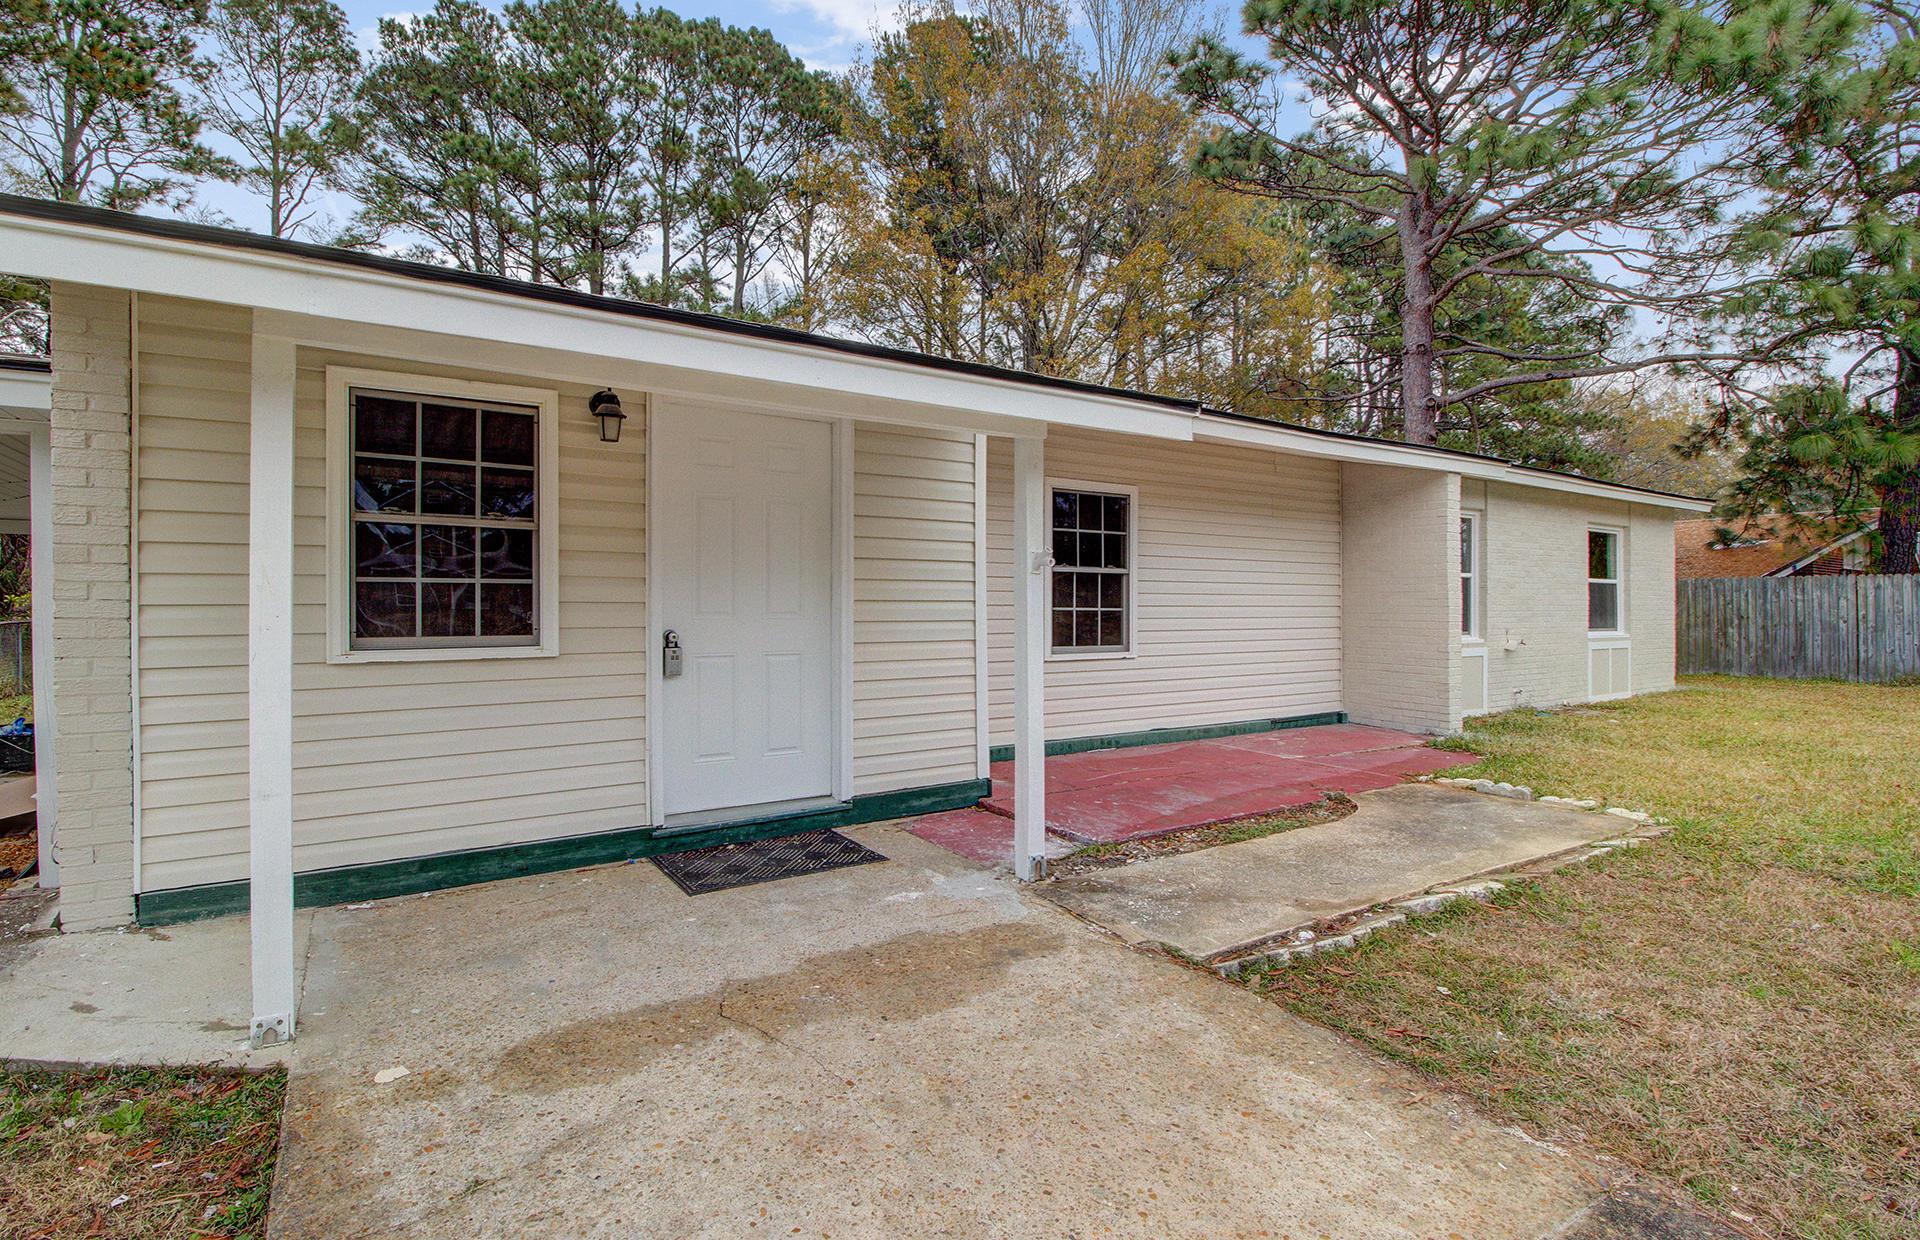 Sedgefield Section I Homes For Sale - 30 Aldene, Goose Creek, SC - 14